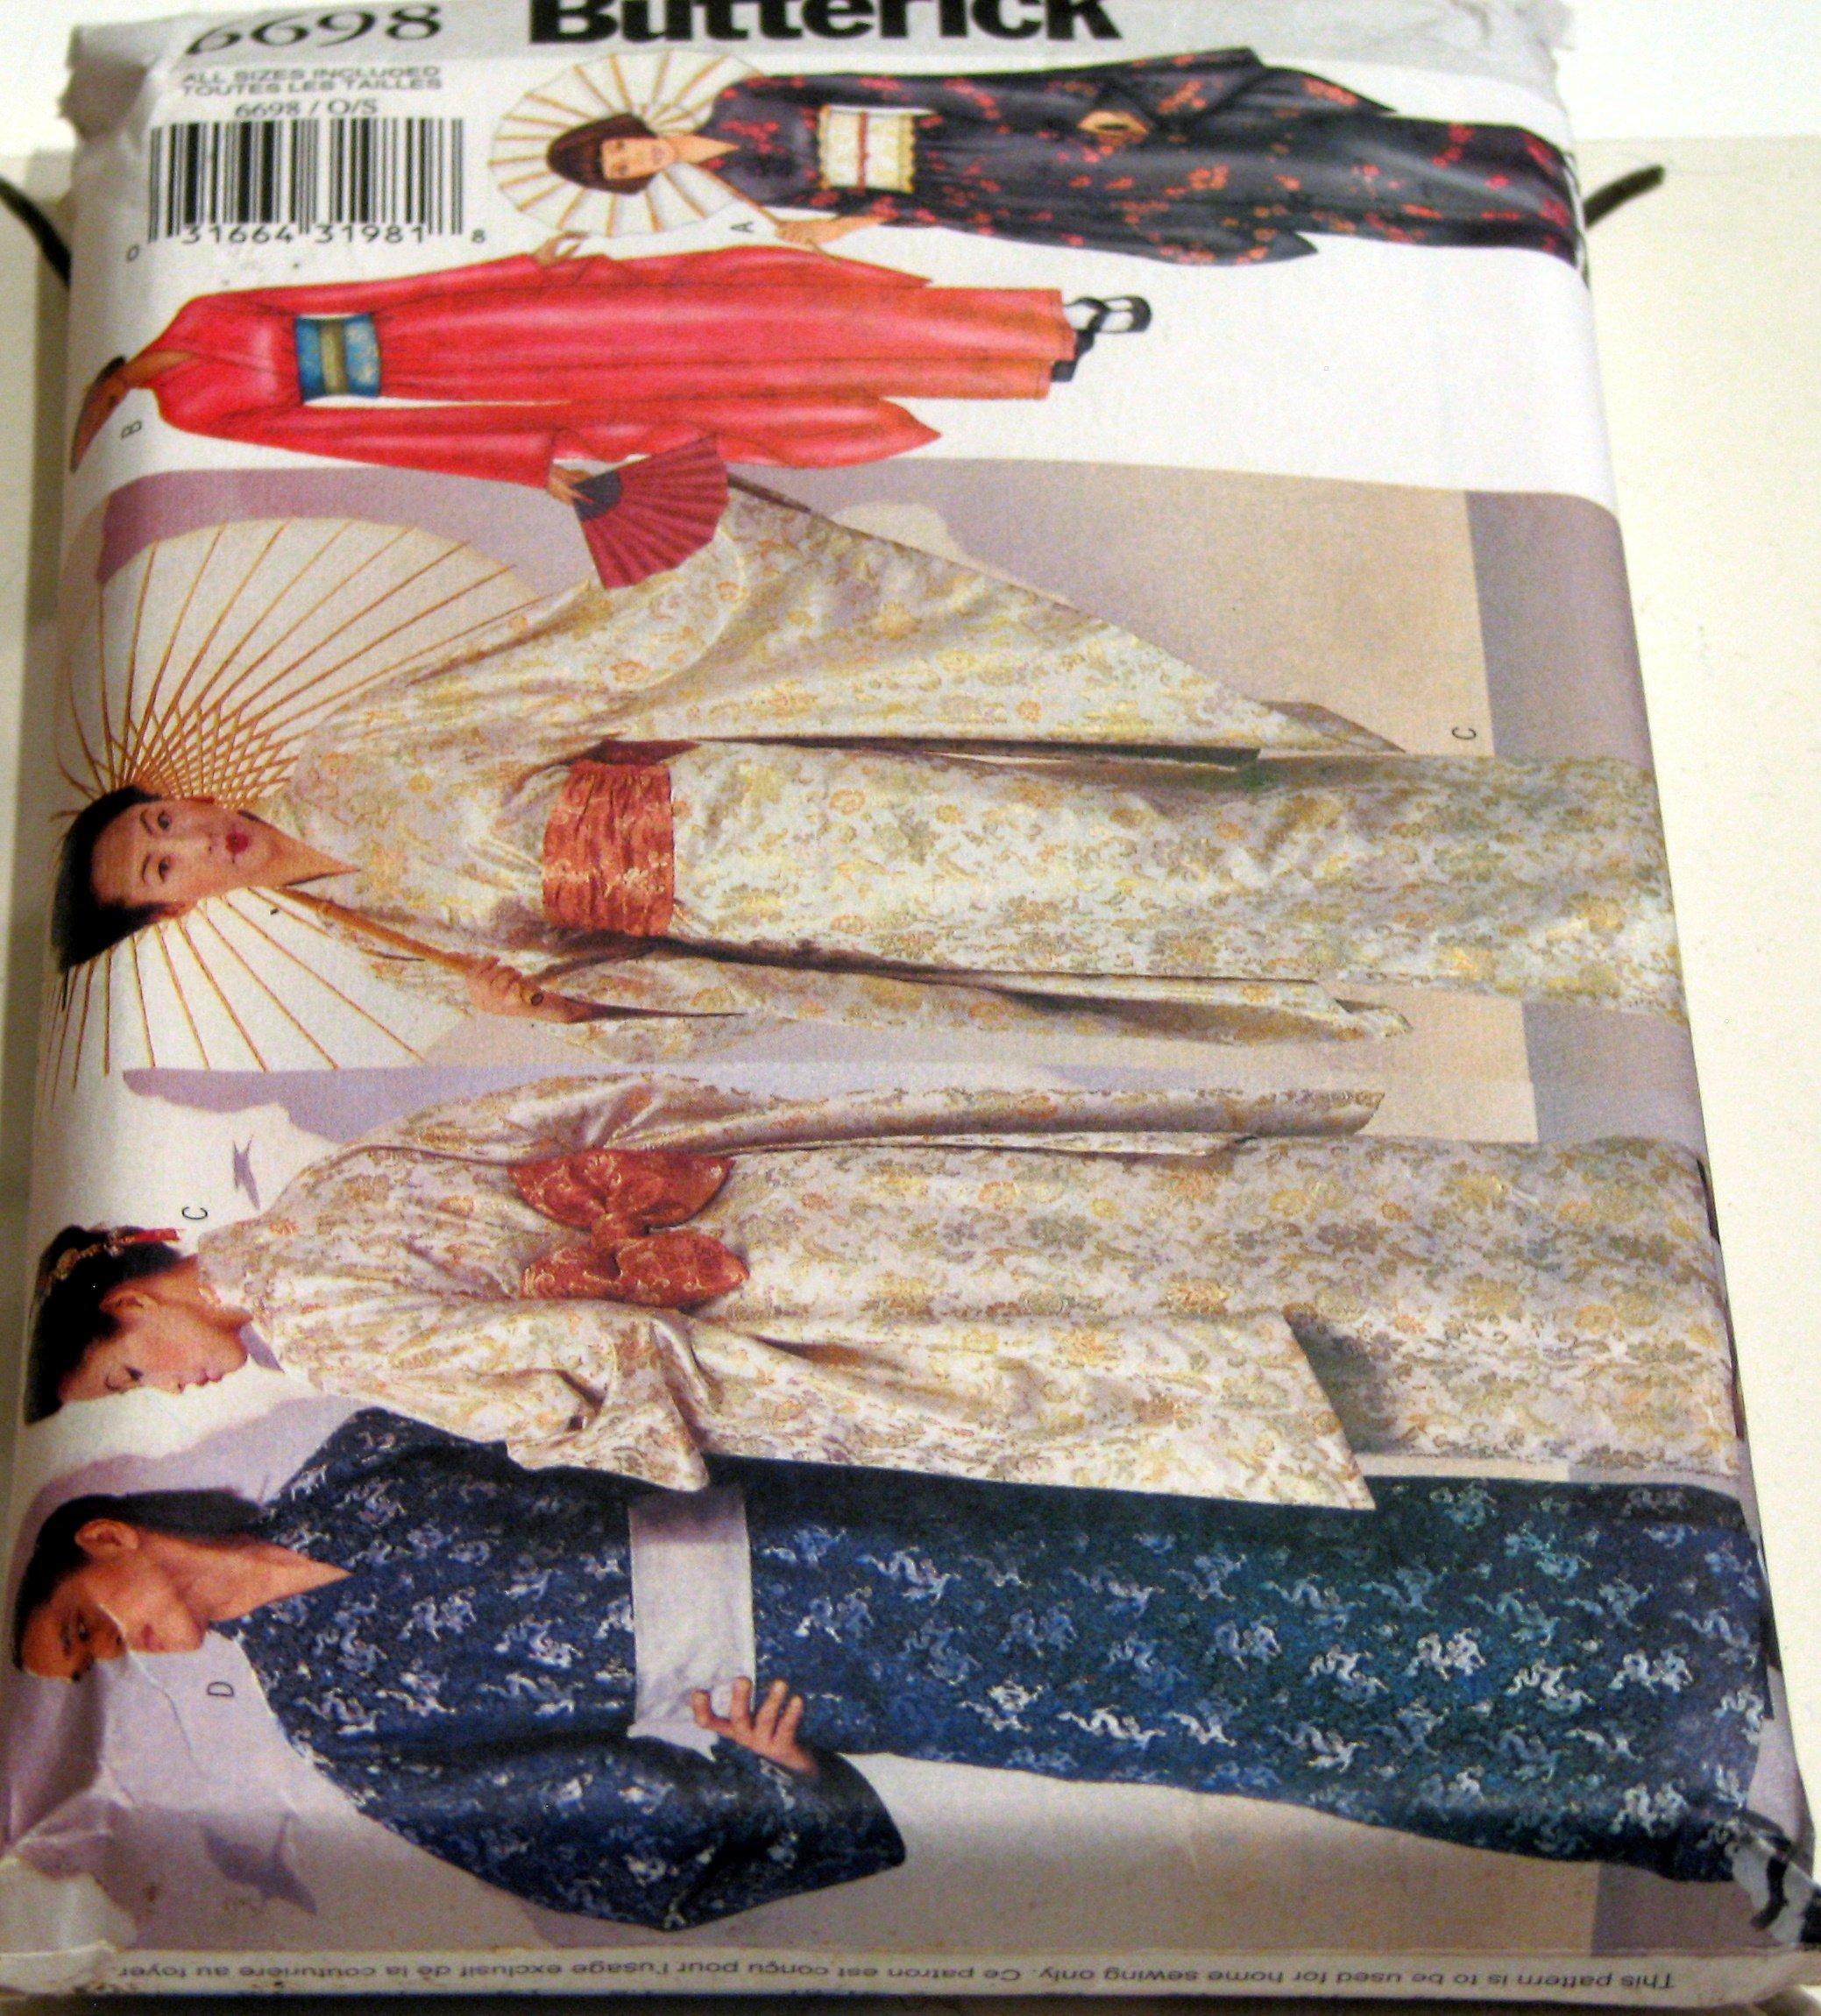 Butterick #6696 - Kimono's Adult patterns by Butterick